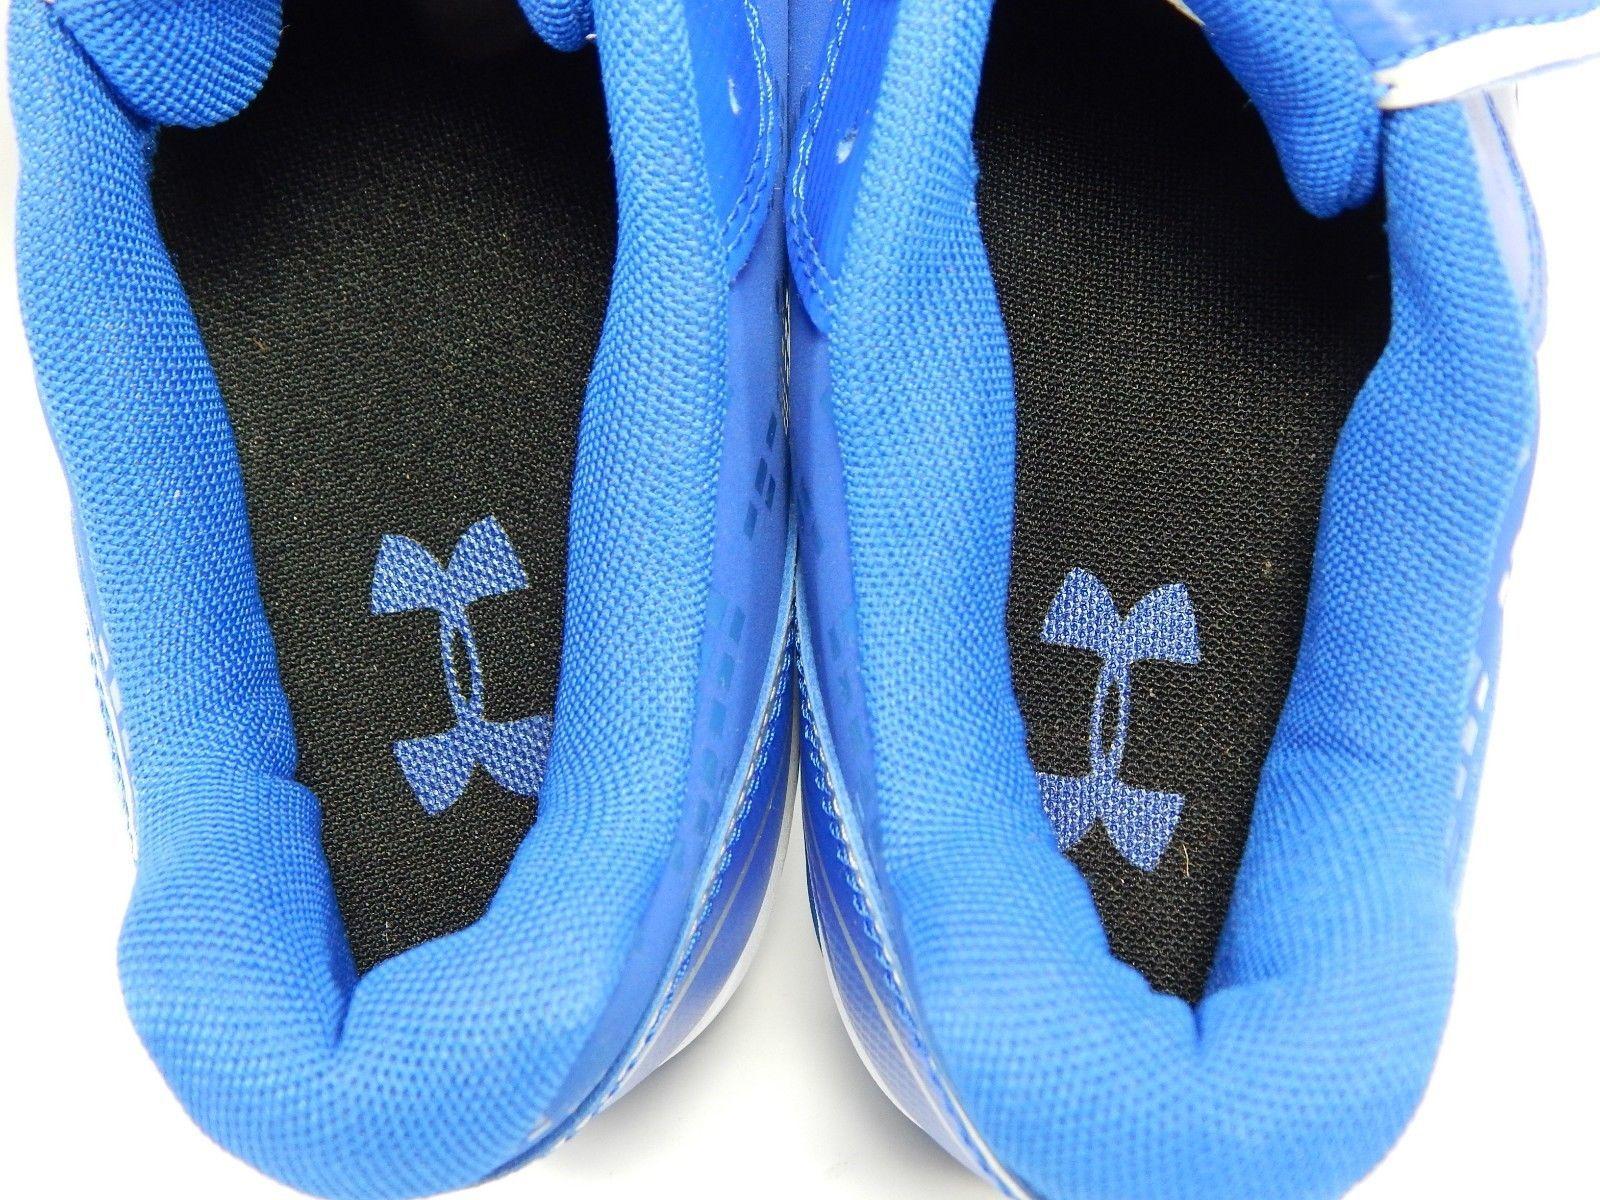 Under Armour Glyde RM CC Size US 9.5 M EU 41 Women's Softball Cleats 1233552-411